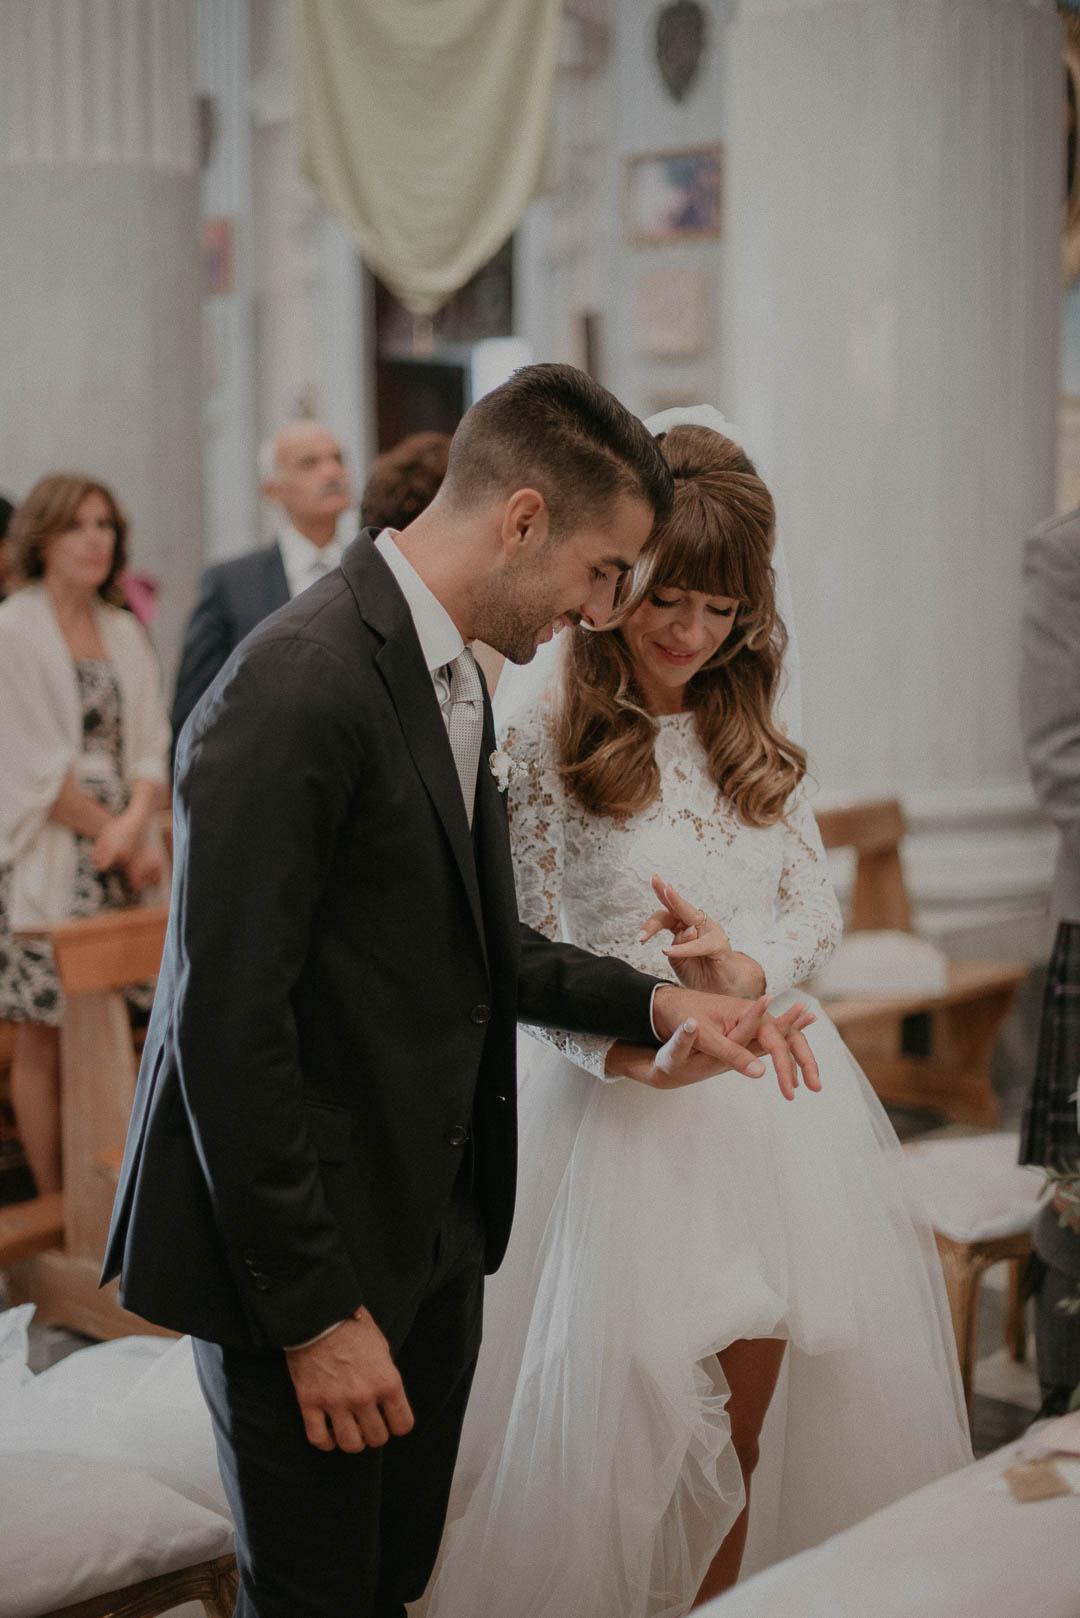 wedding-photographer-destination-fineart-bespoke-reportage-napoli-nabilah-vivianeizzo-spazio46-73